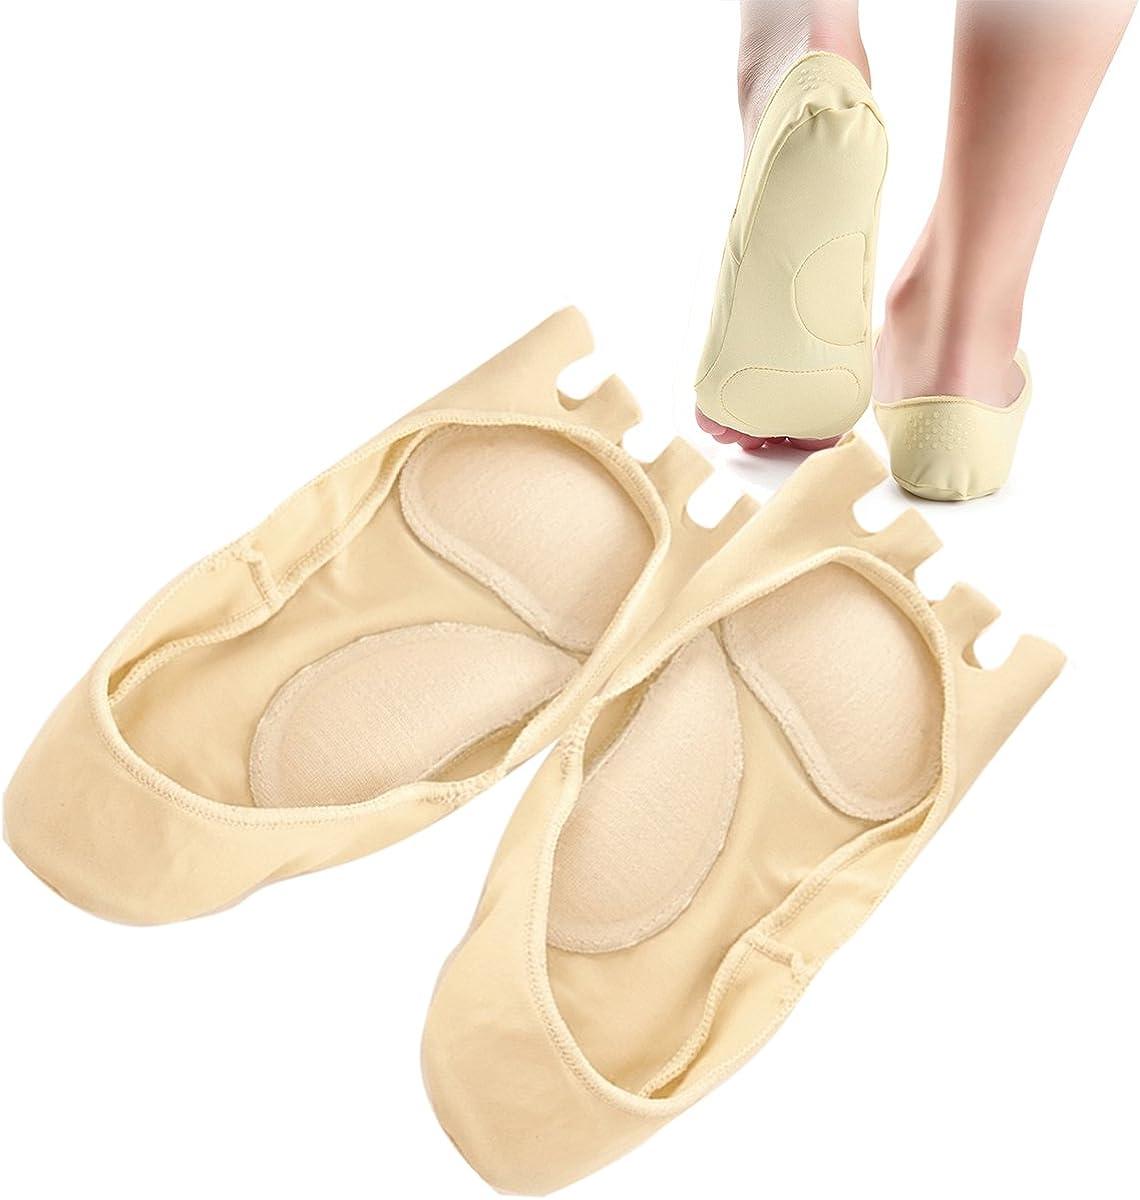 Separator Yoga Socks Acrh Care Front Foot Pad Socks Meomory foam Five Toe